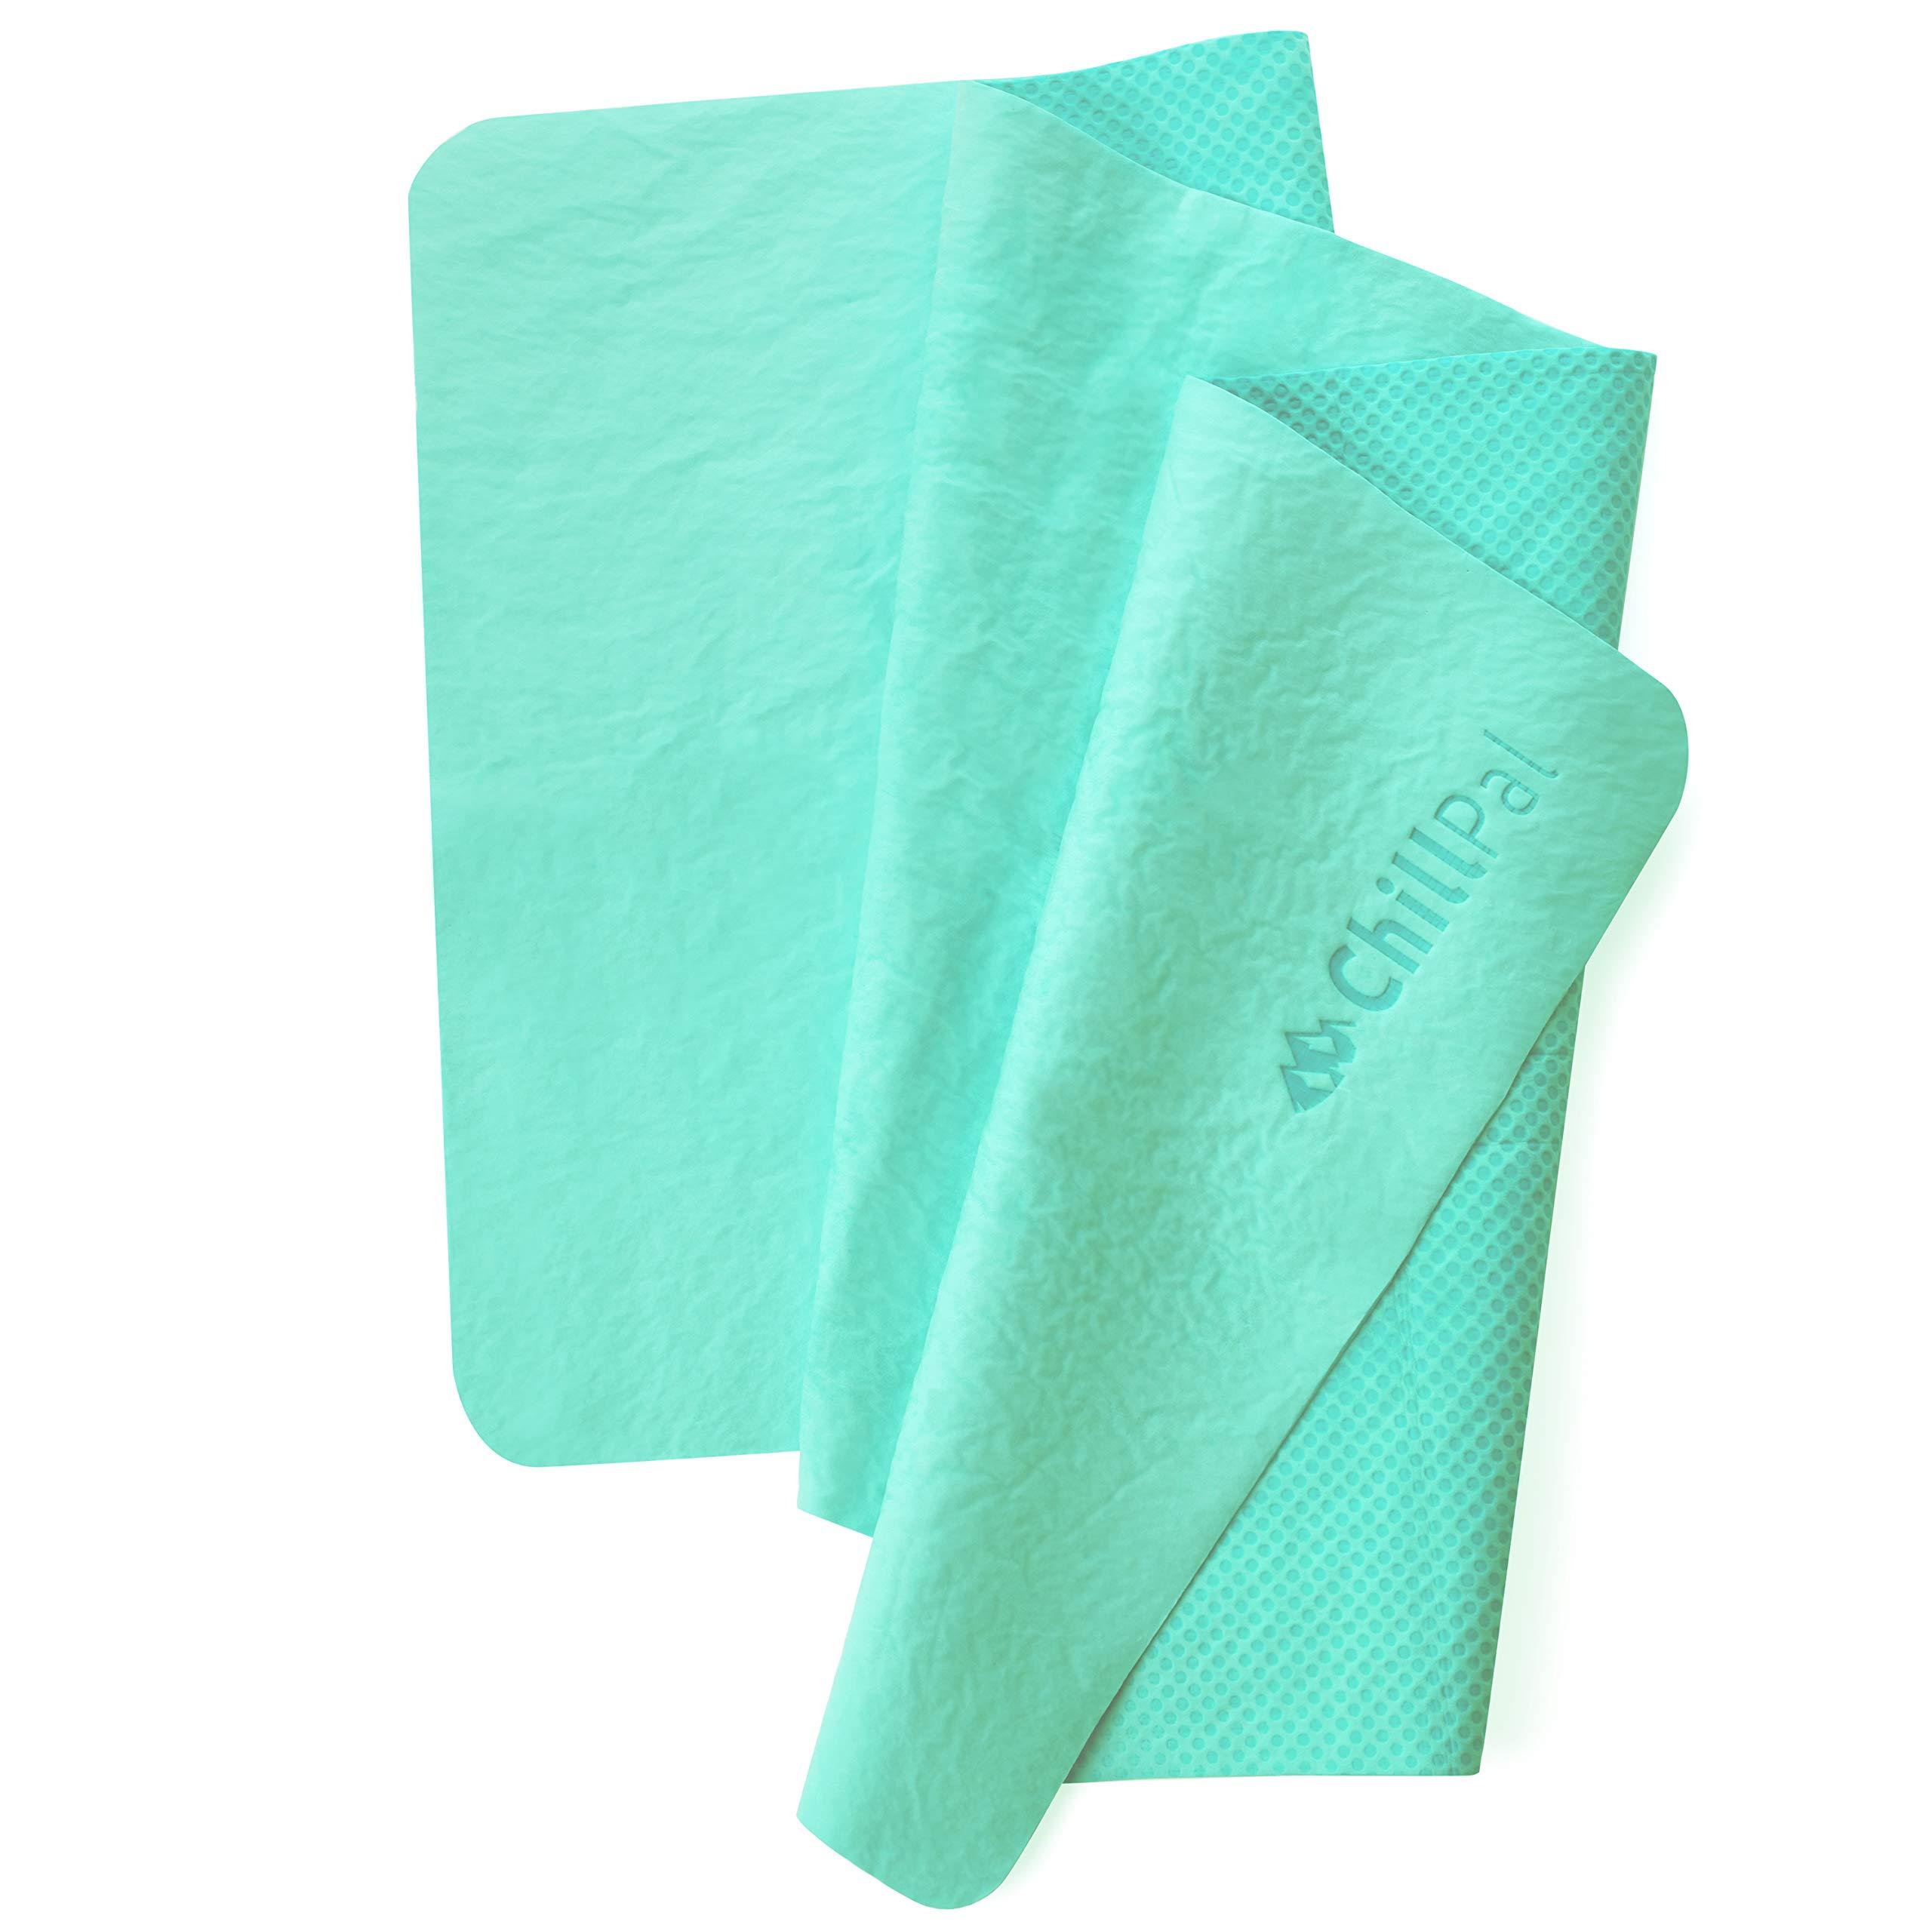 Chill Pal PVA Cooling Towel (Aqua Blue) by Chill Pal